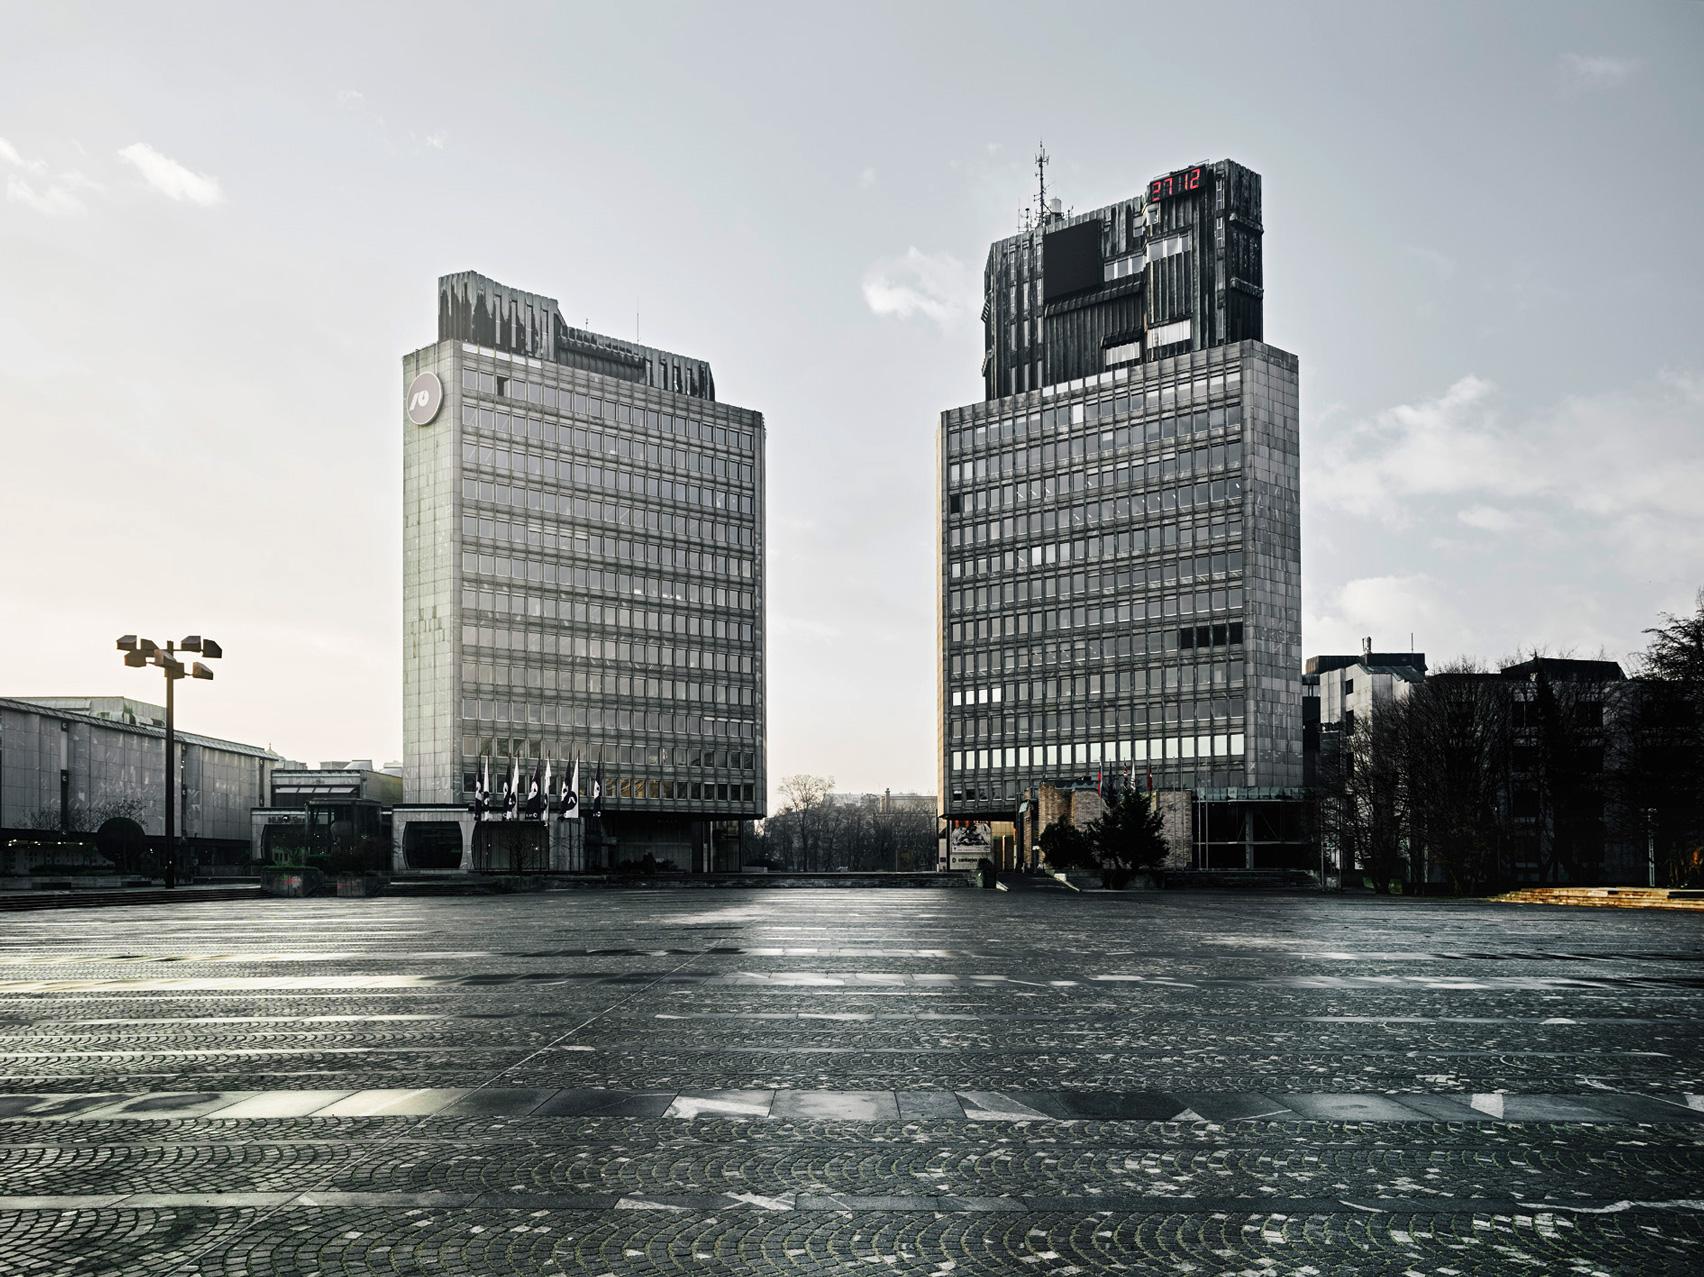 Revolution Square by Edvard Ravnikar